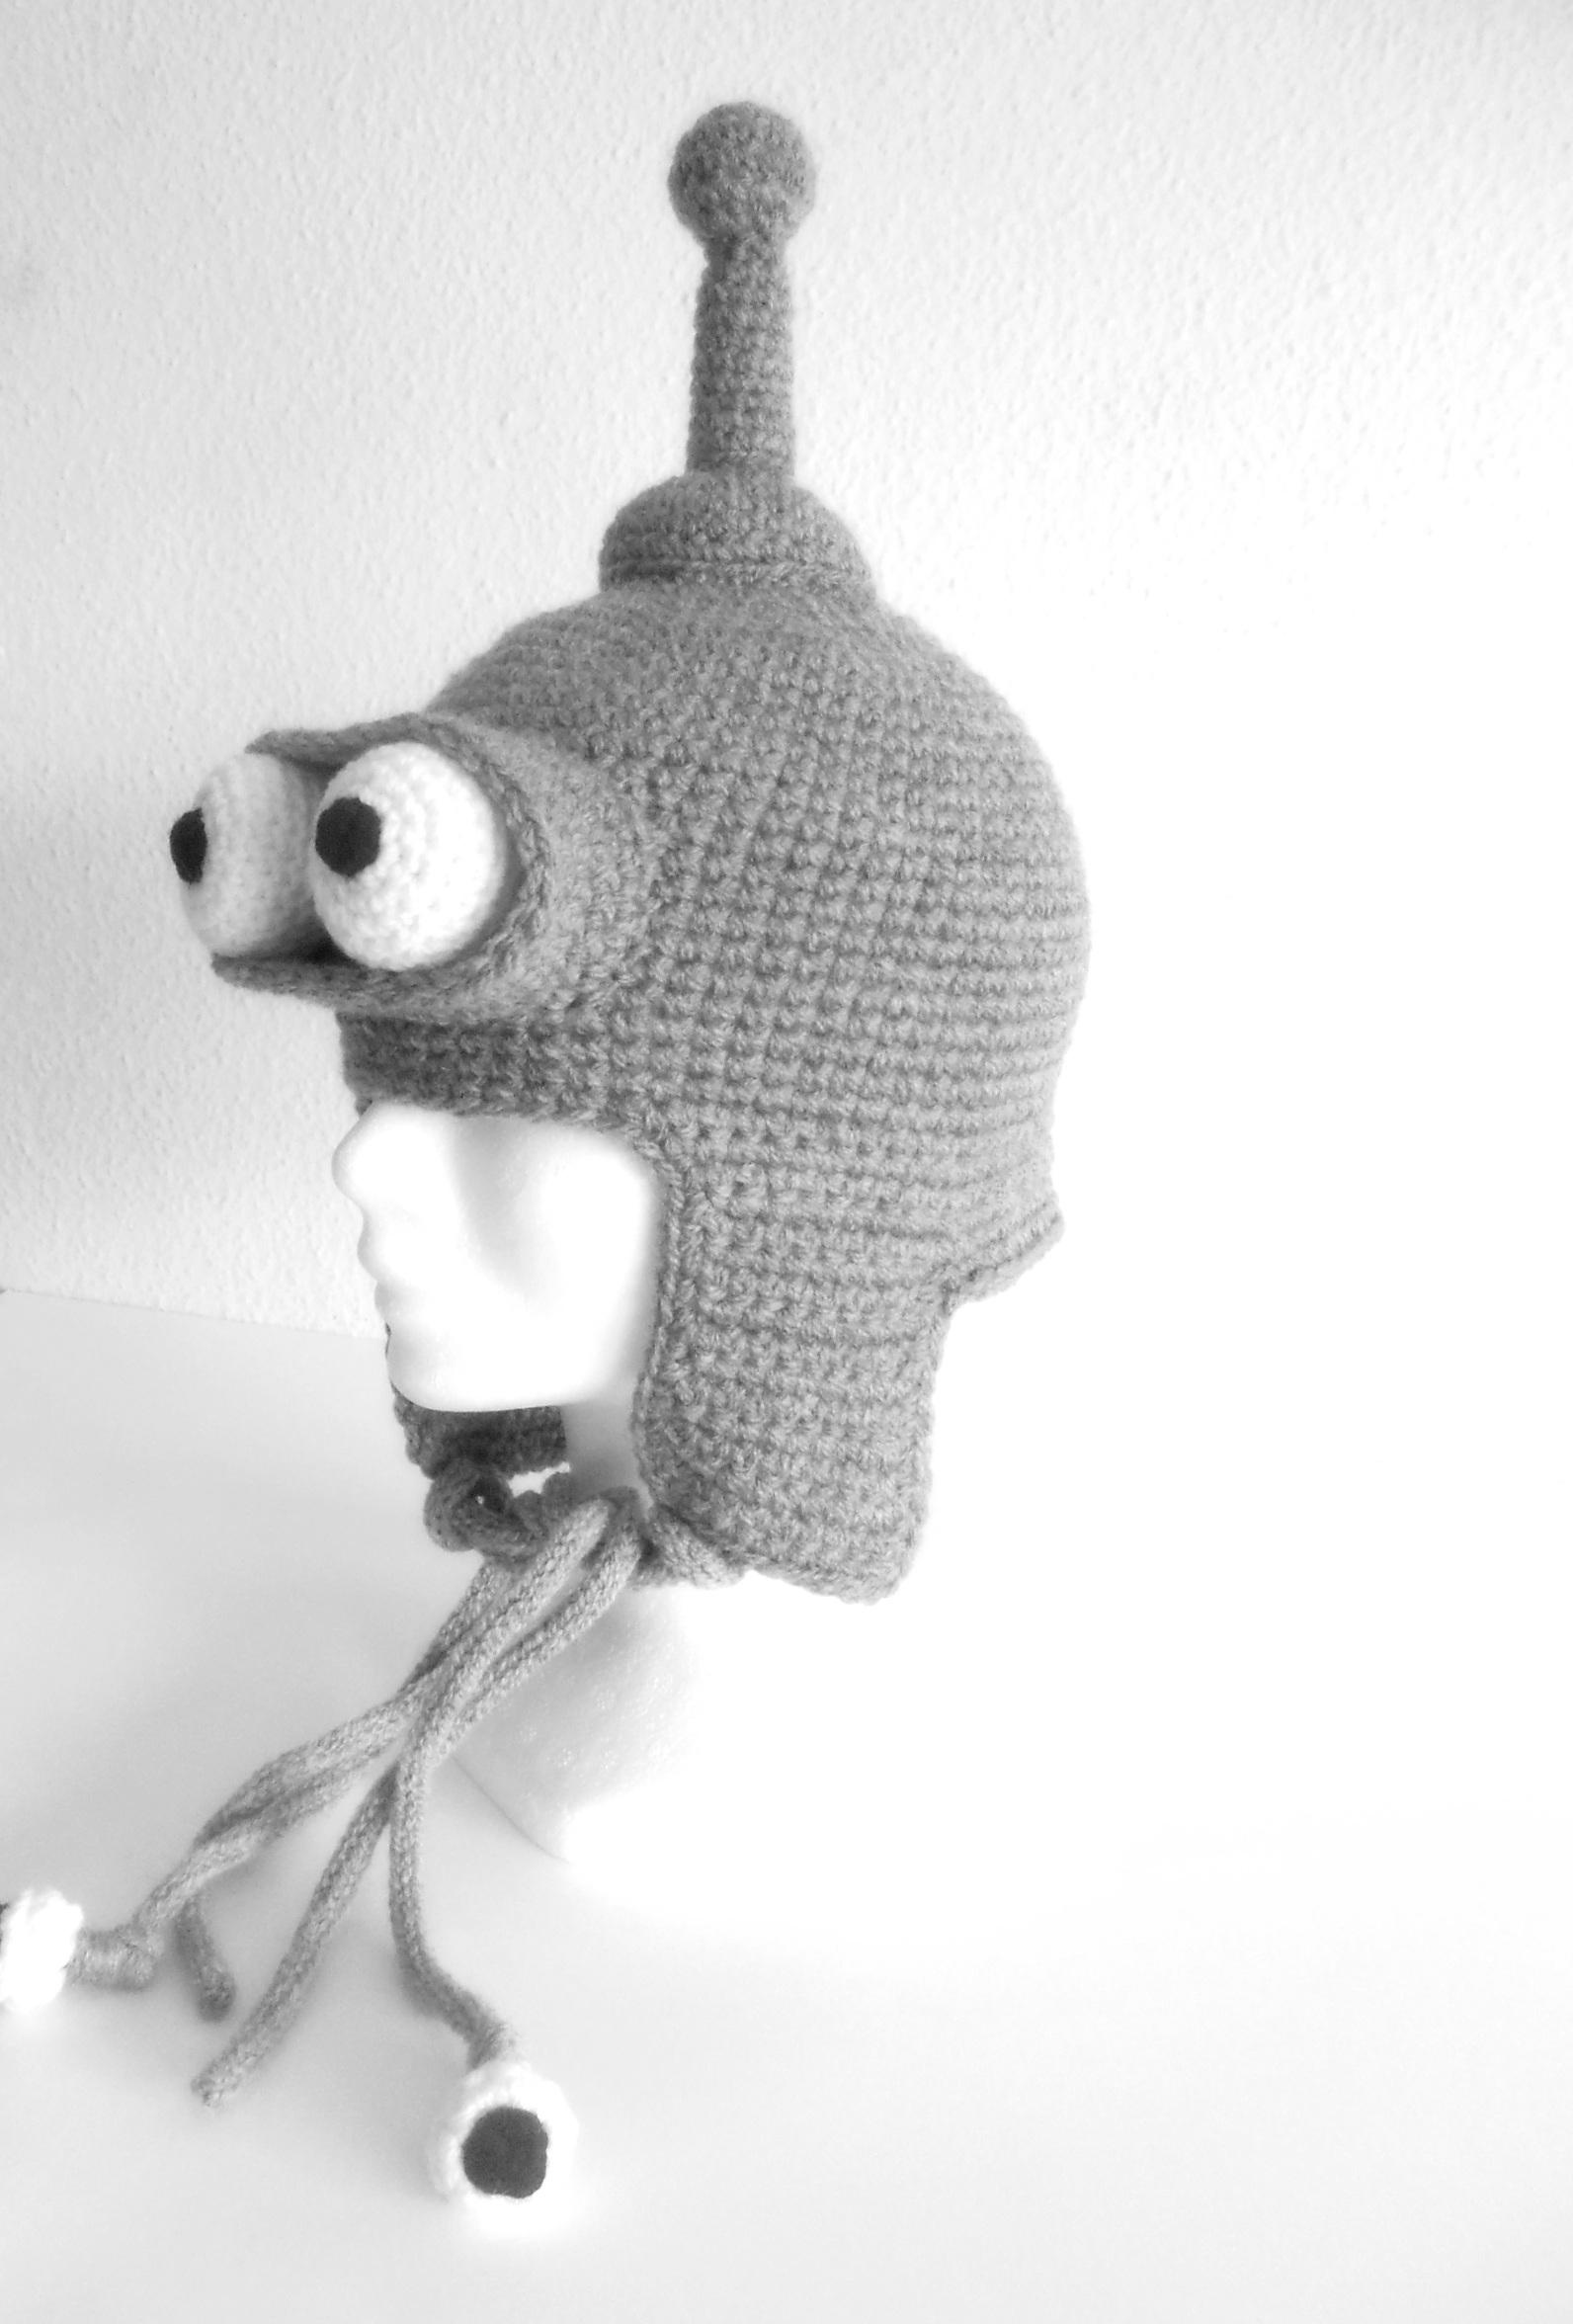 Gorro Bender, el gorro más divertido! — Pipocass handmade